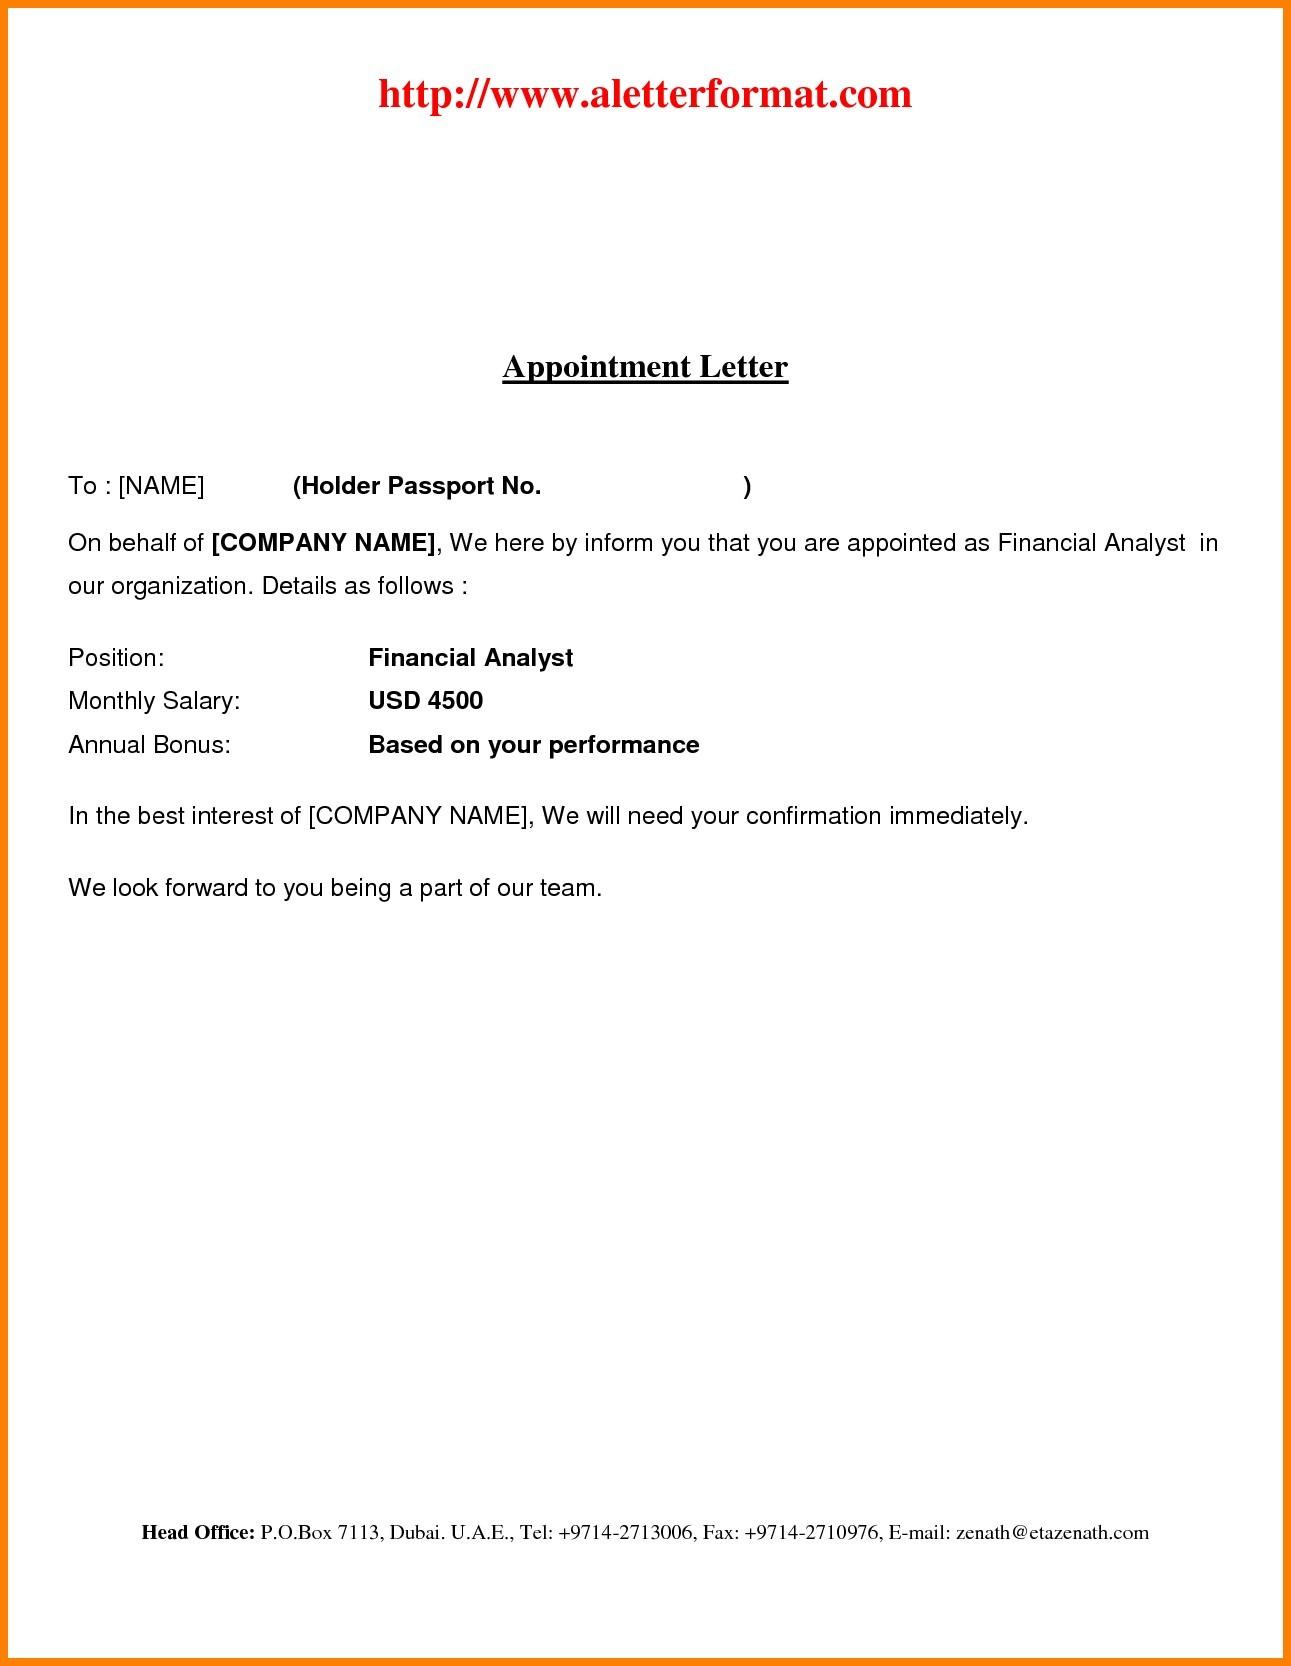 job offer letter template unique job fer letter template word